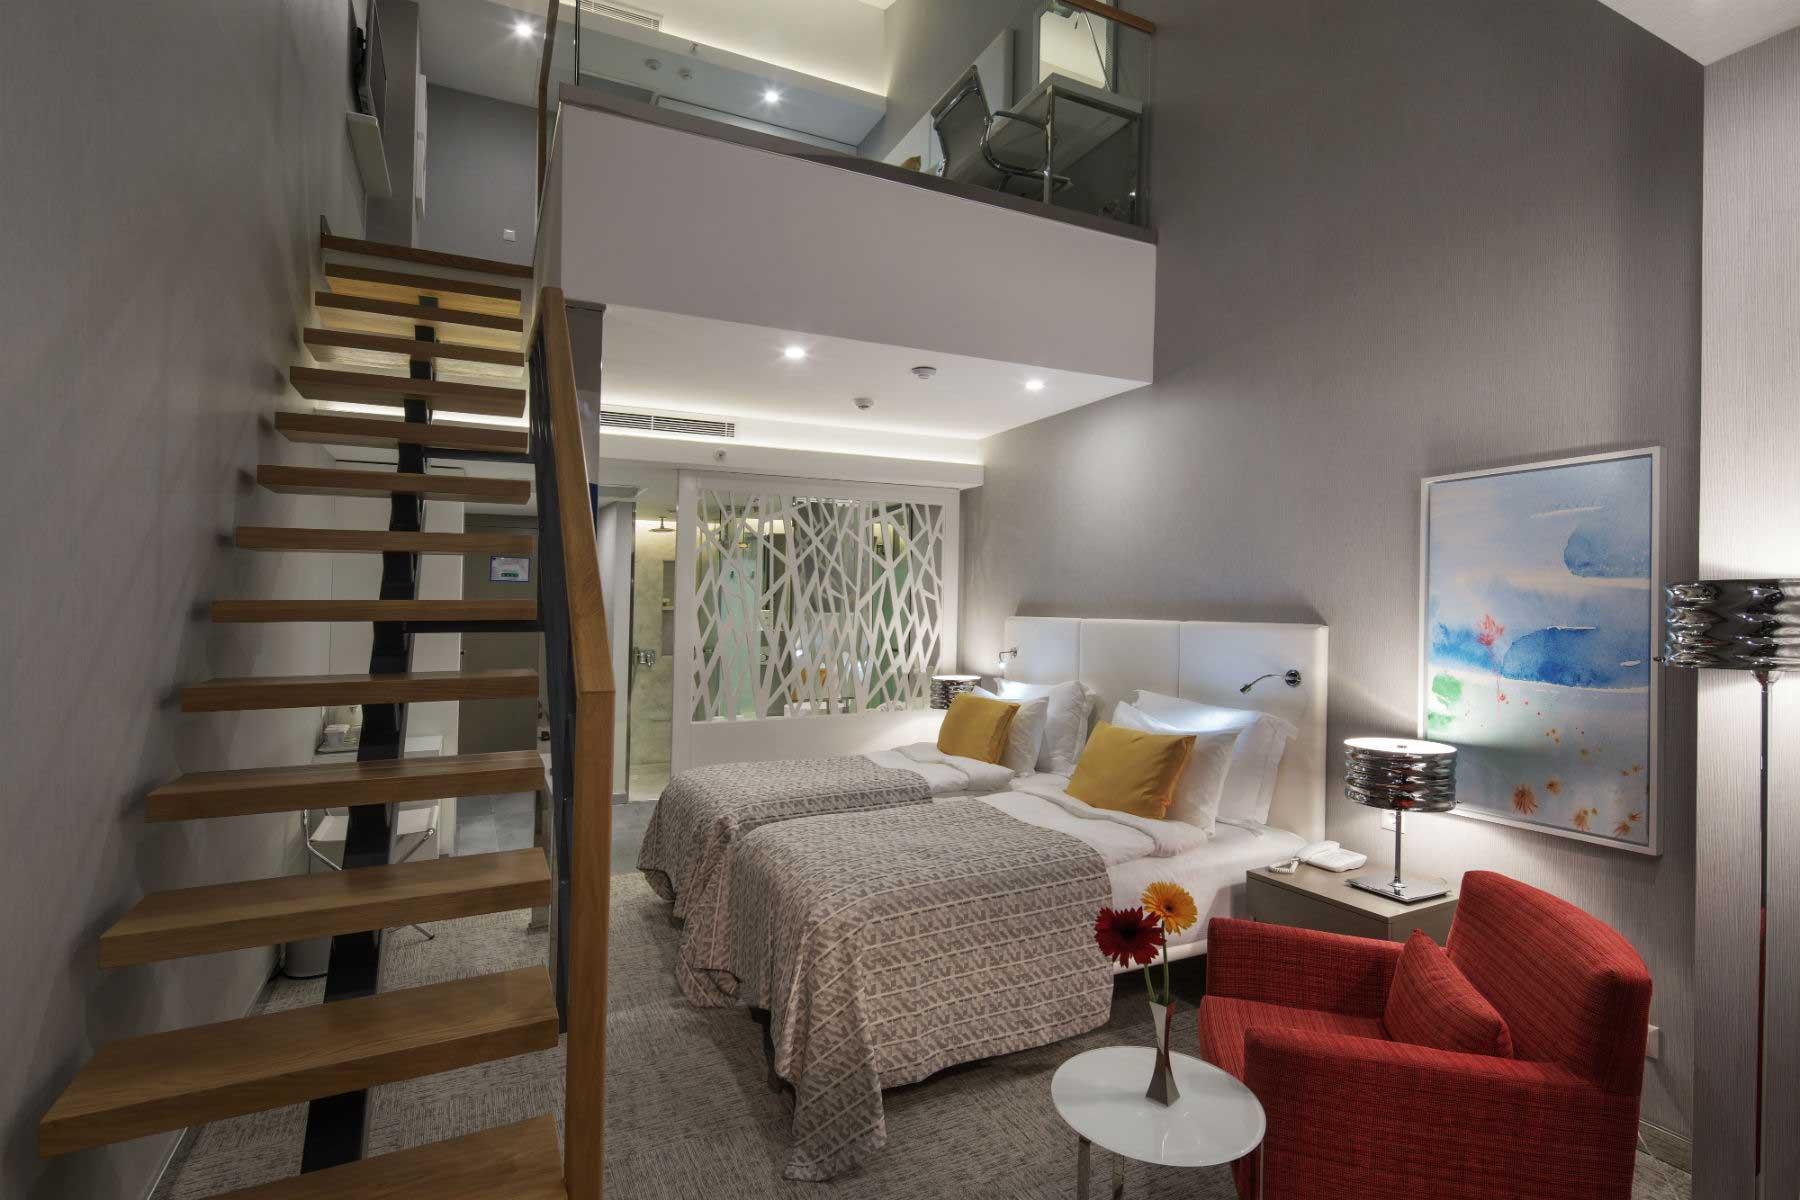 The Sense De Luxe familiekamer